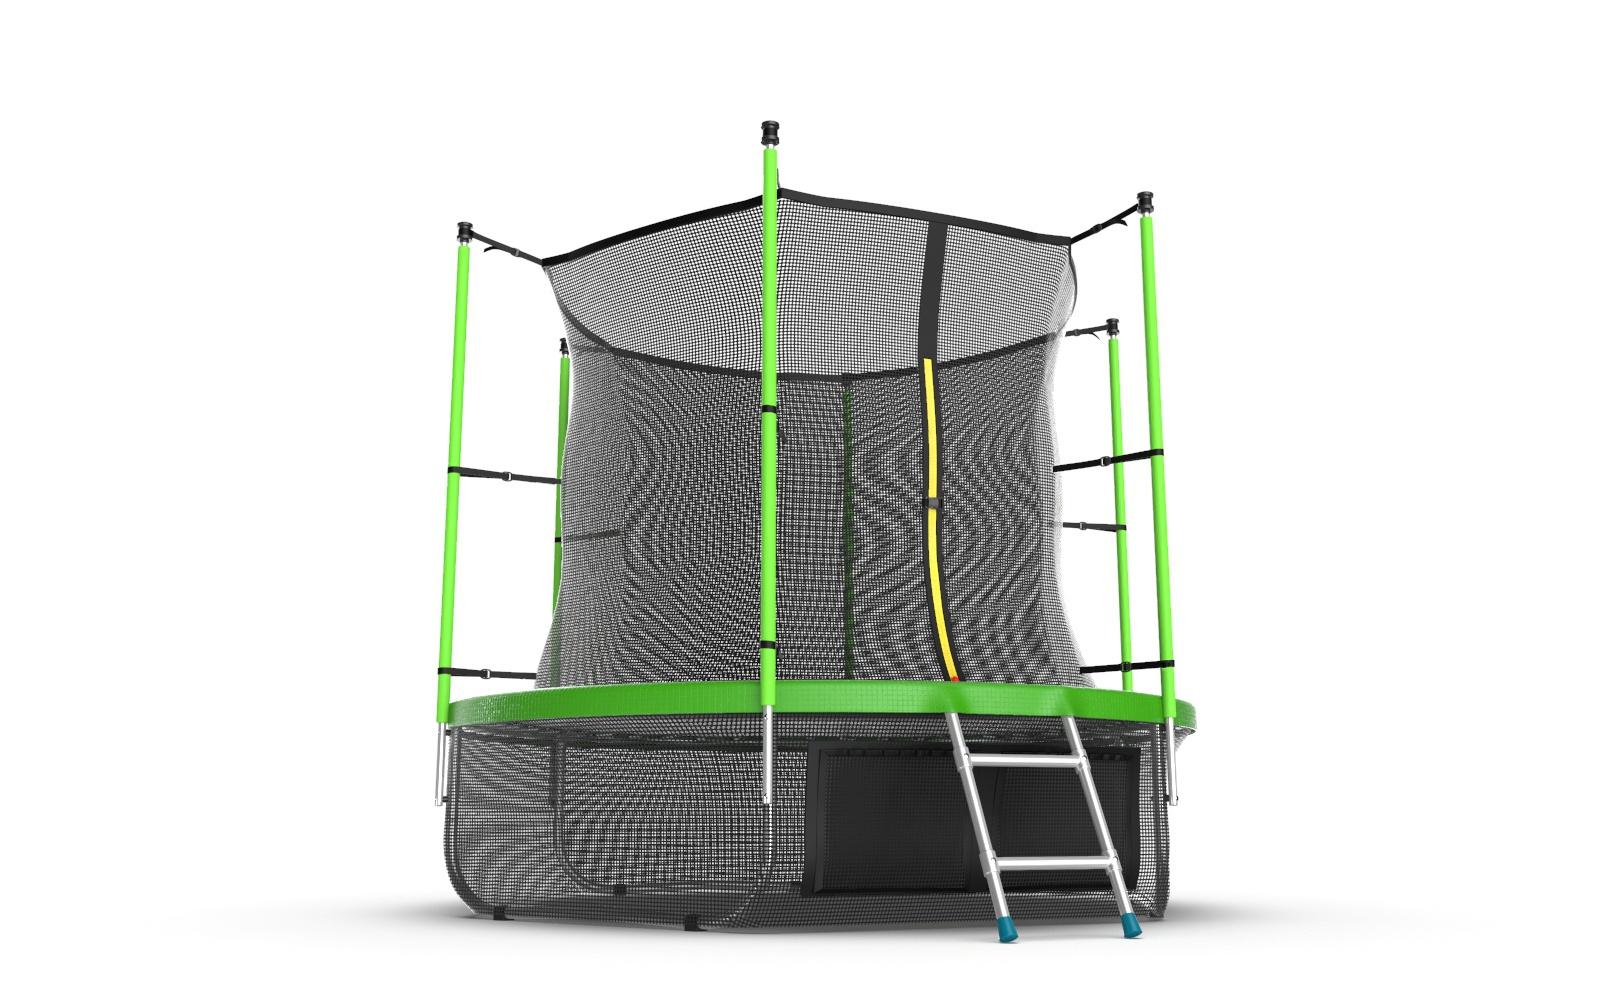 Батут с внутренней сеткой и лестницей, EVO JUMP Internal 8ft (Green) батут 8ft 2 44м